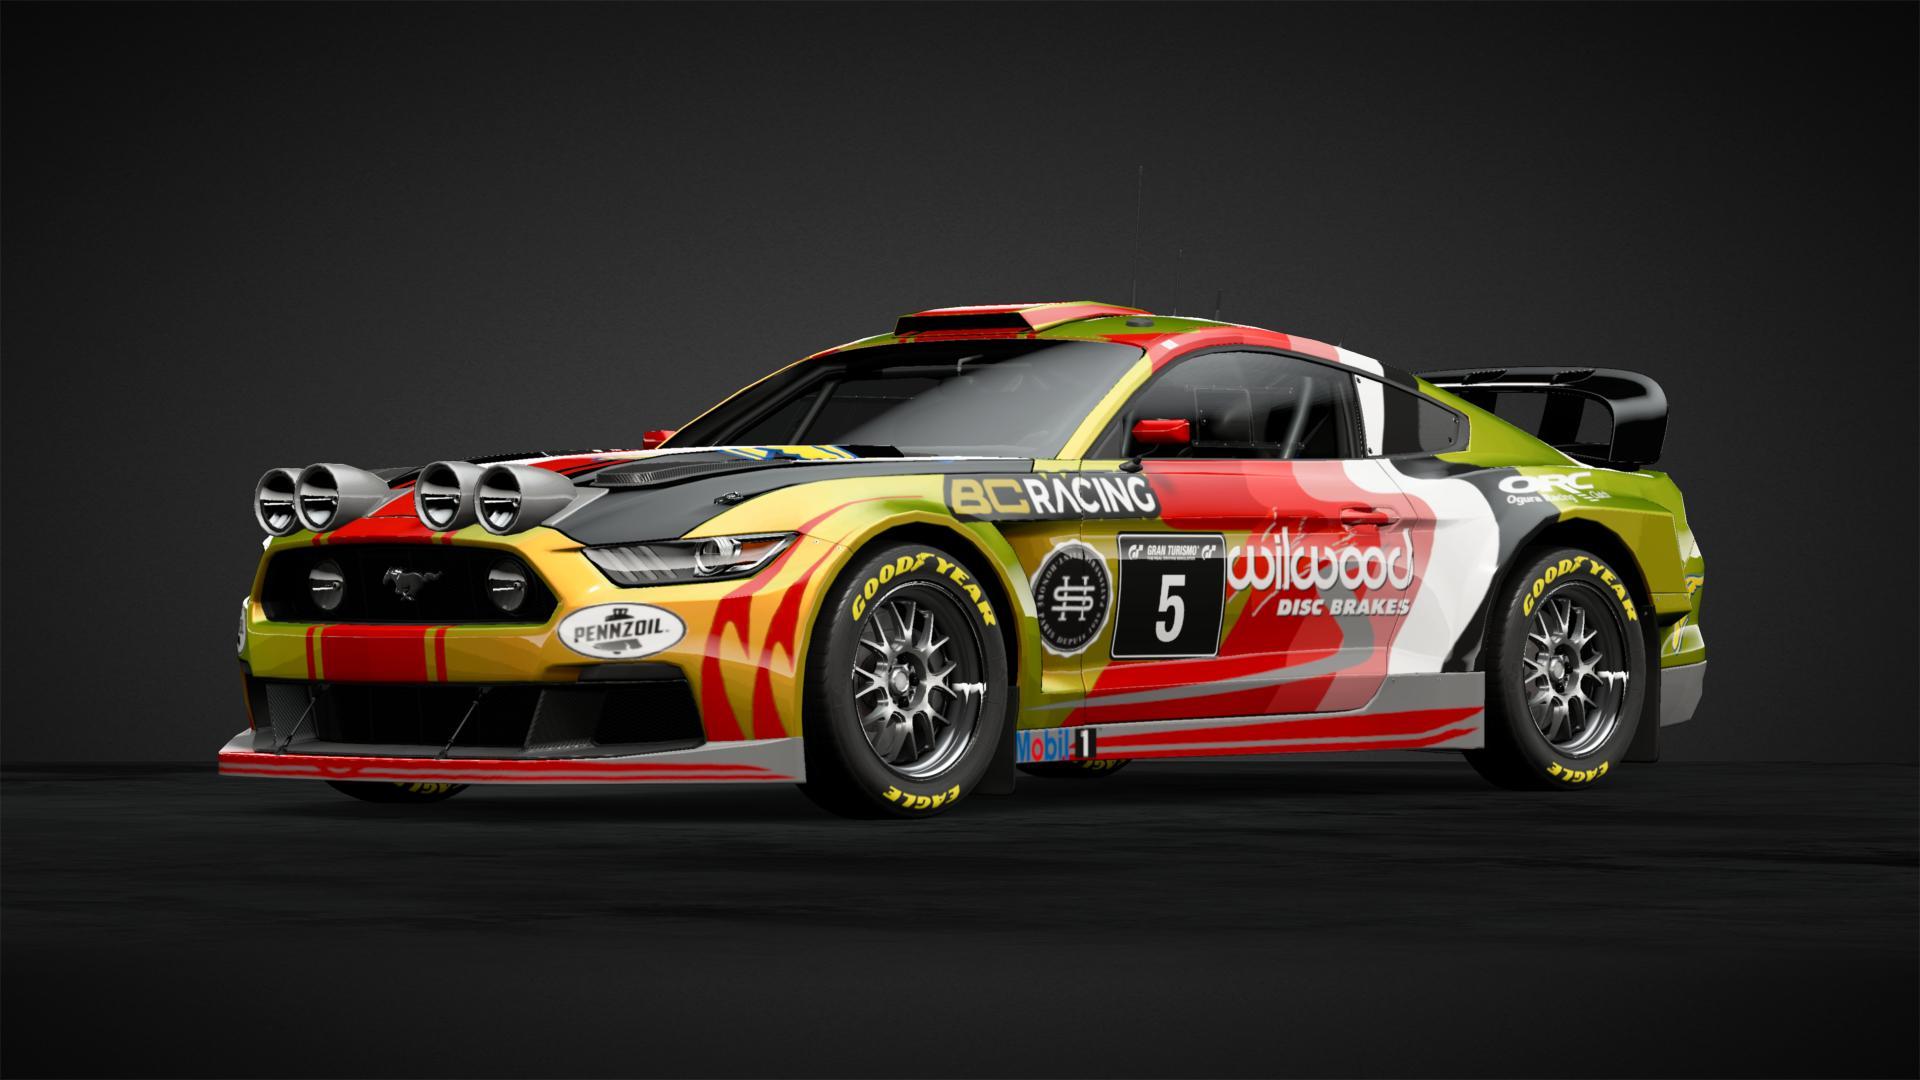 Mustang Race Team - Car Livery by Pampfi | Community | Gran